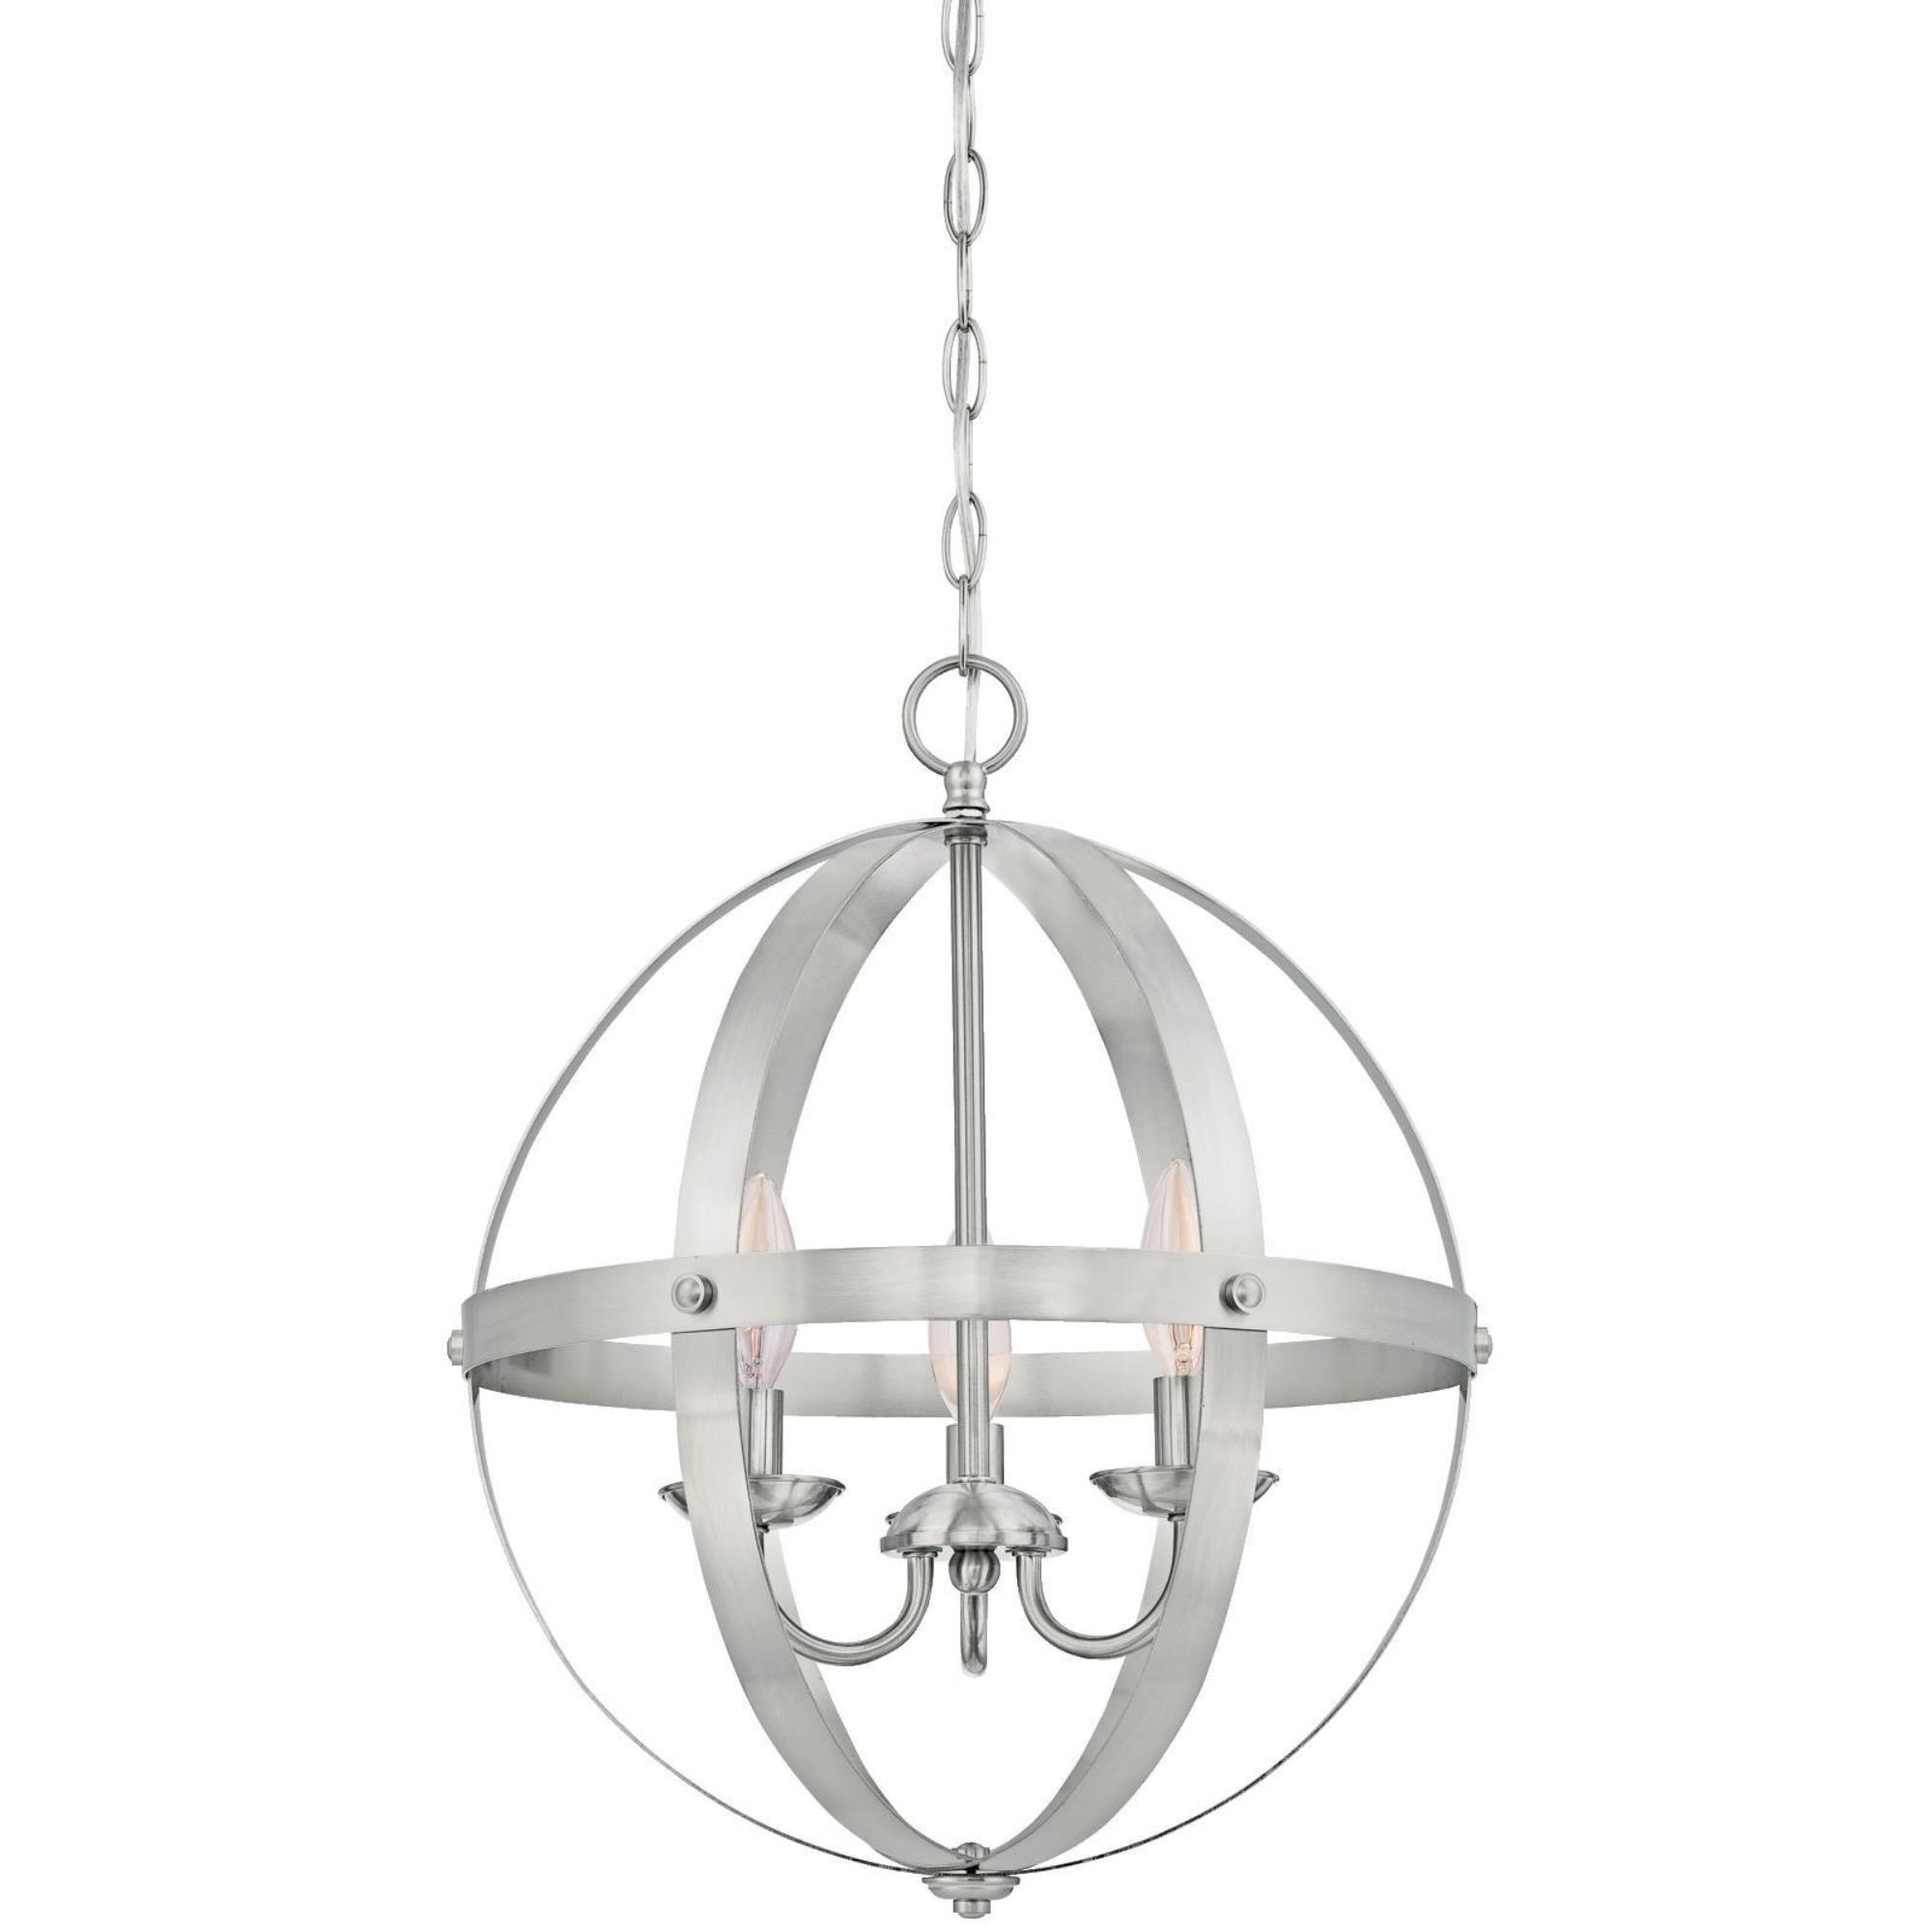 Westinghouse 6341900 Stella Mira Three-Light Indoor Chandelier, Brushed Nickel Finish